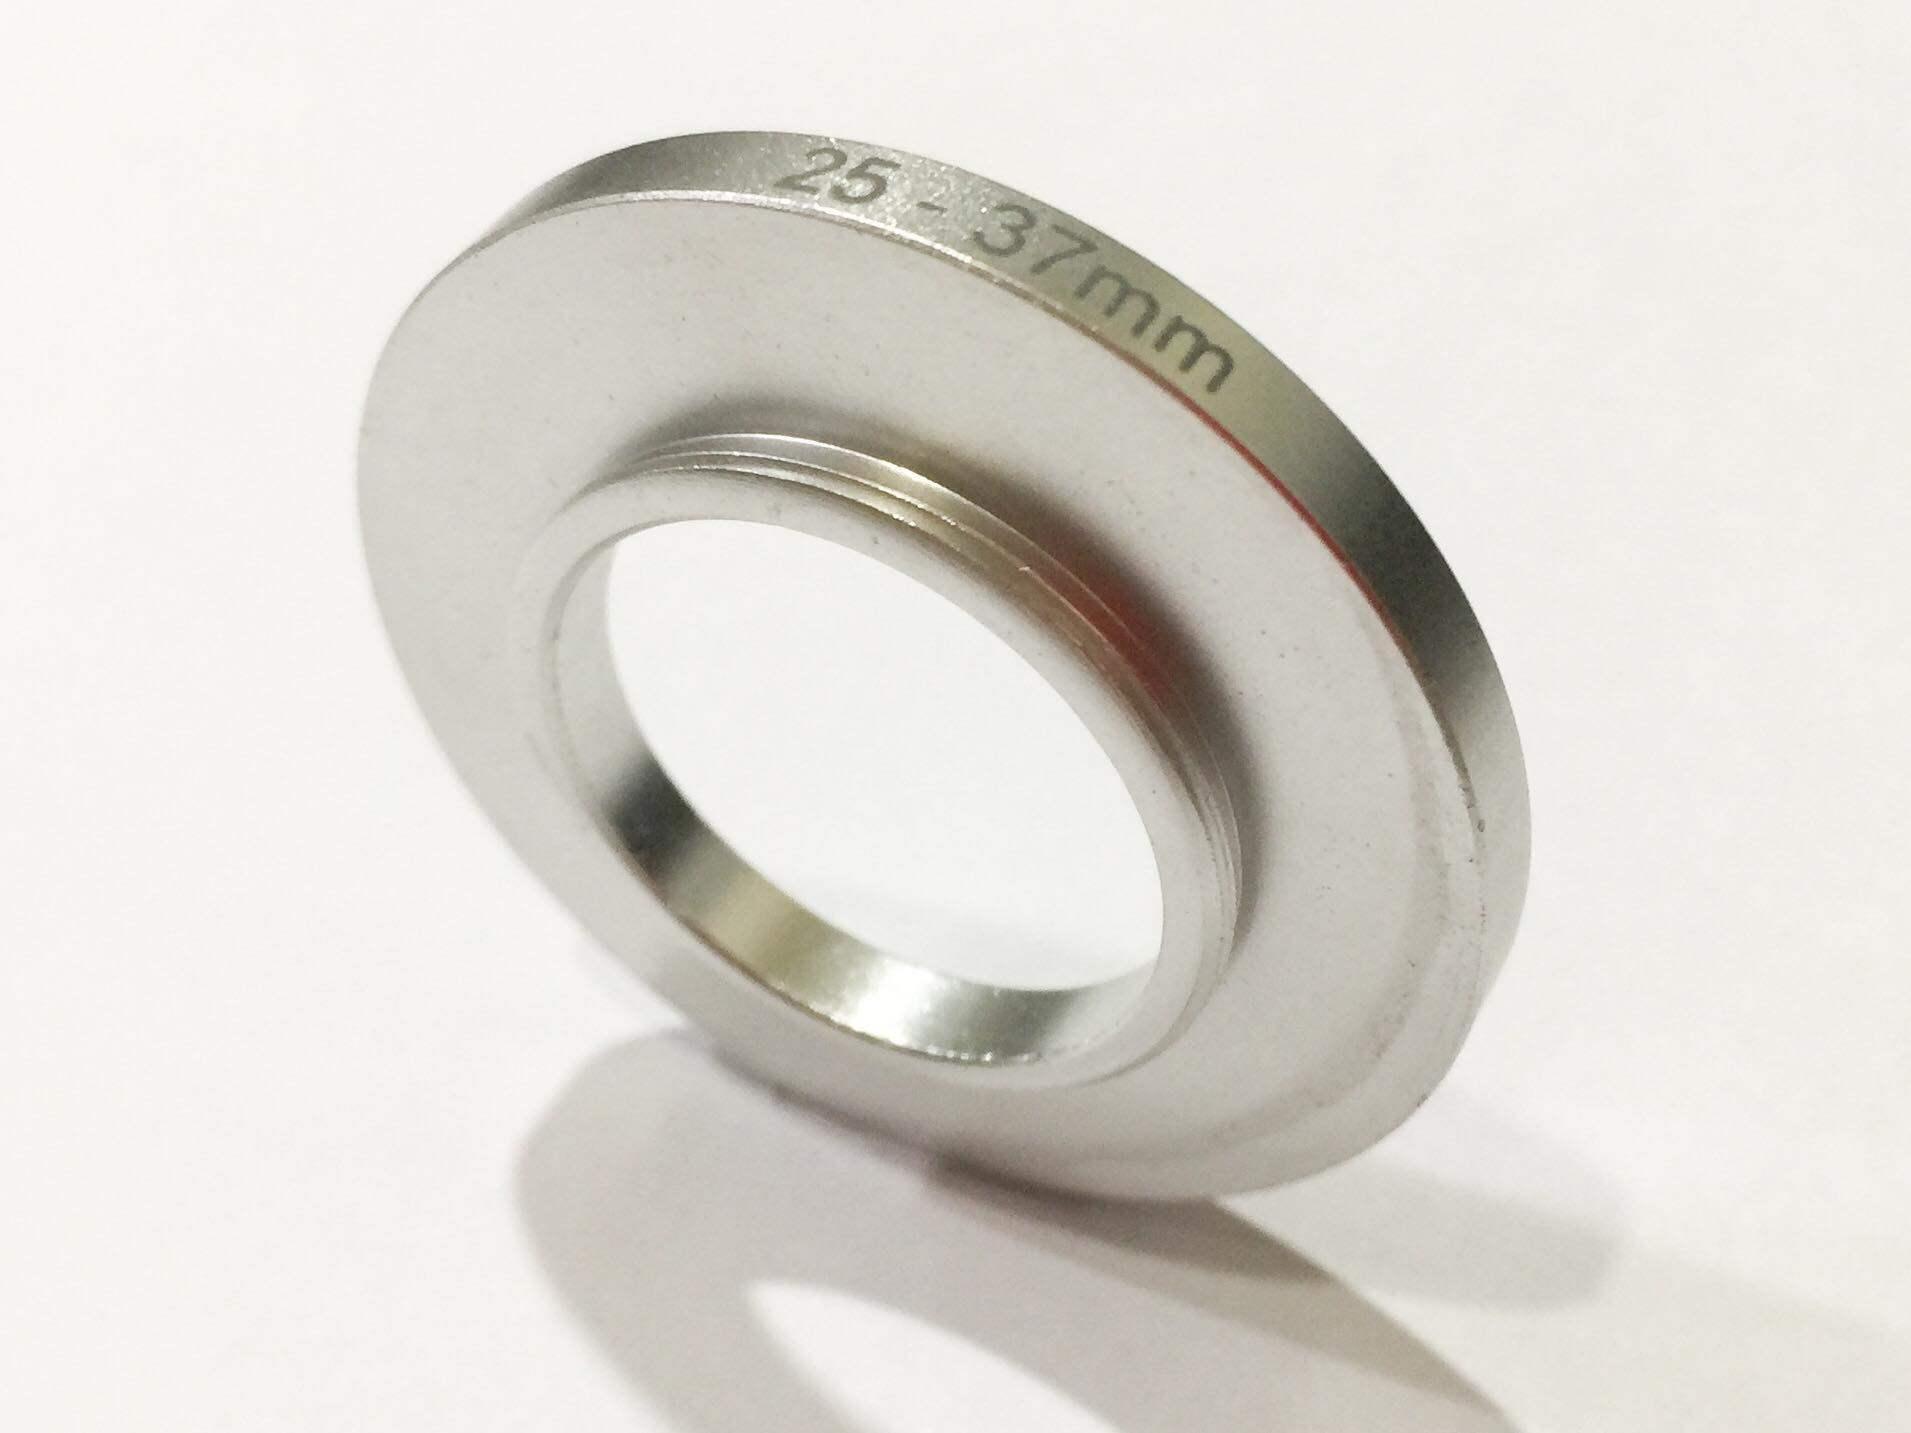 Step Ring 25-37mm, 30-37mm, 30.5-37mm.